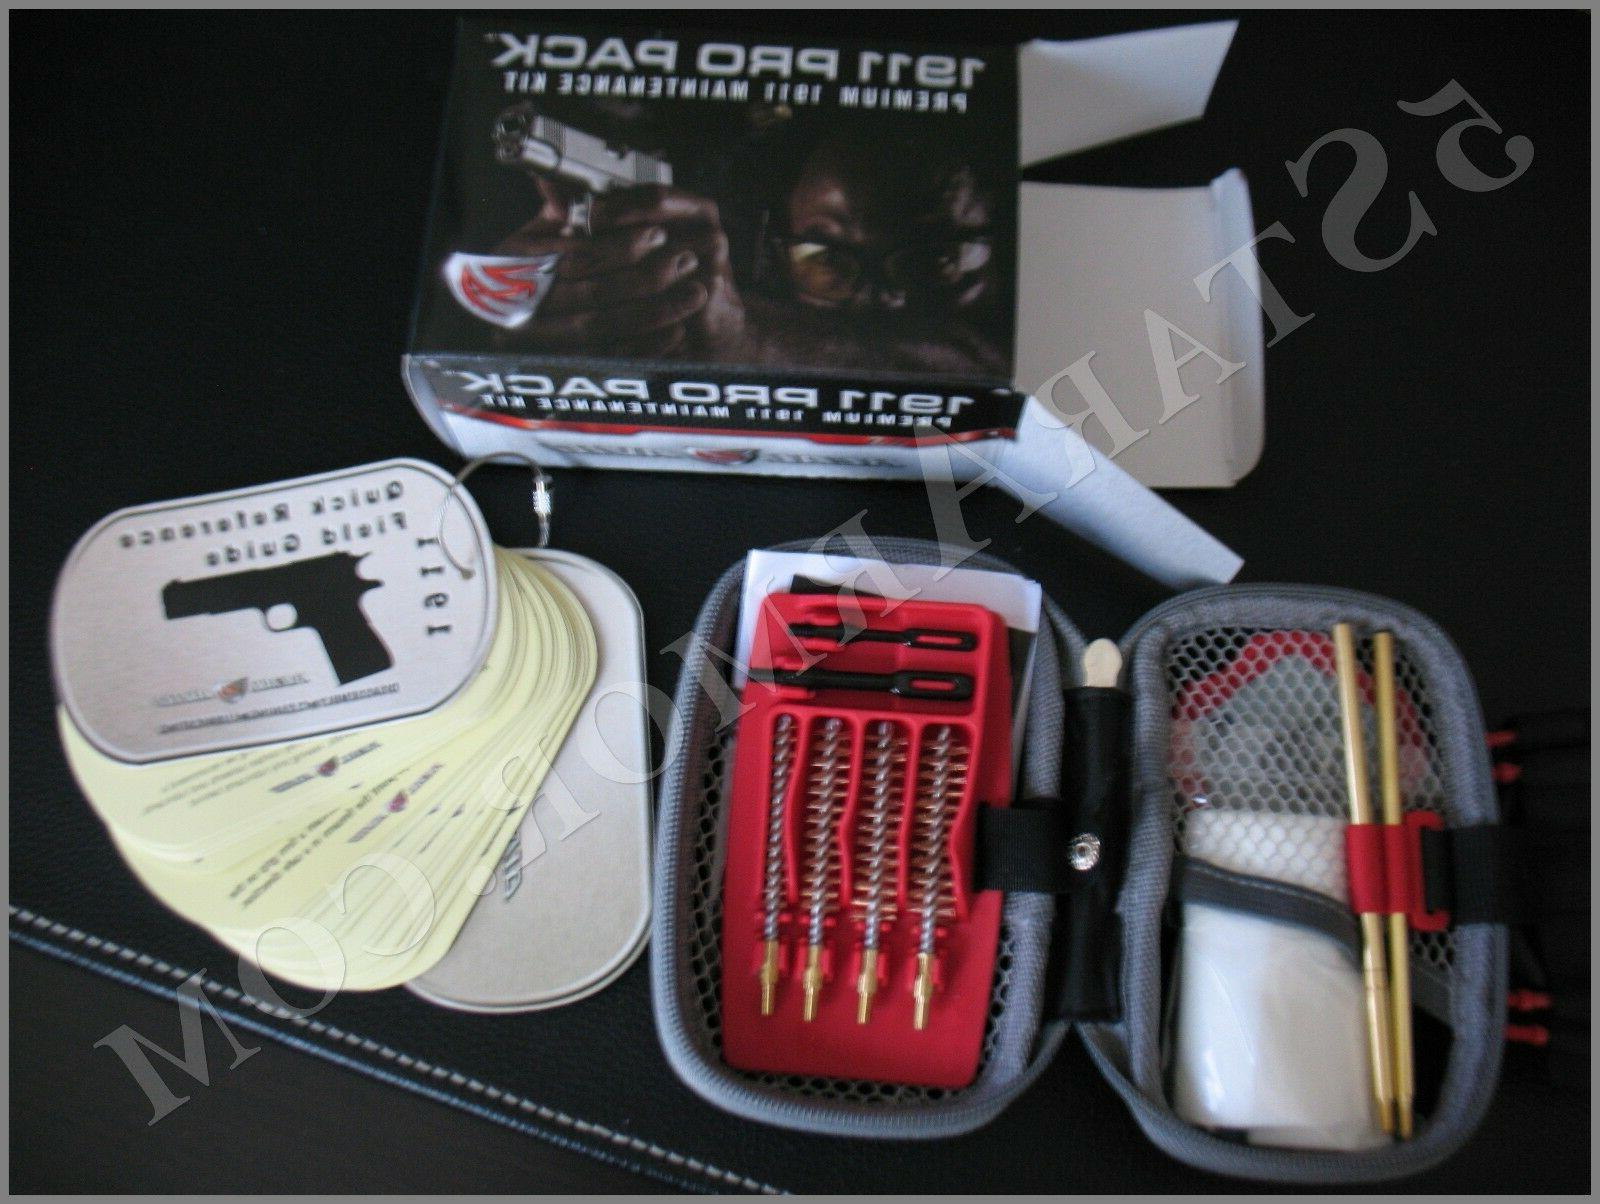 Real Avid 1911 Pro Pack Premium Handgun Cleaning Maintenance